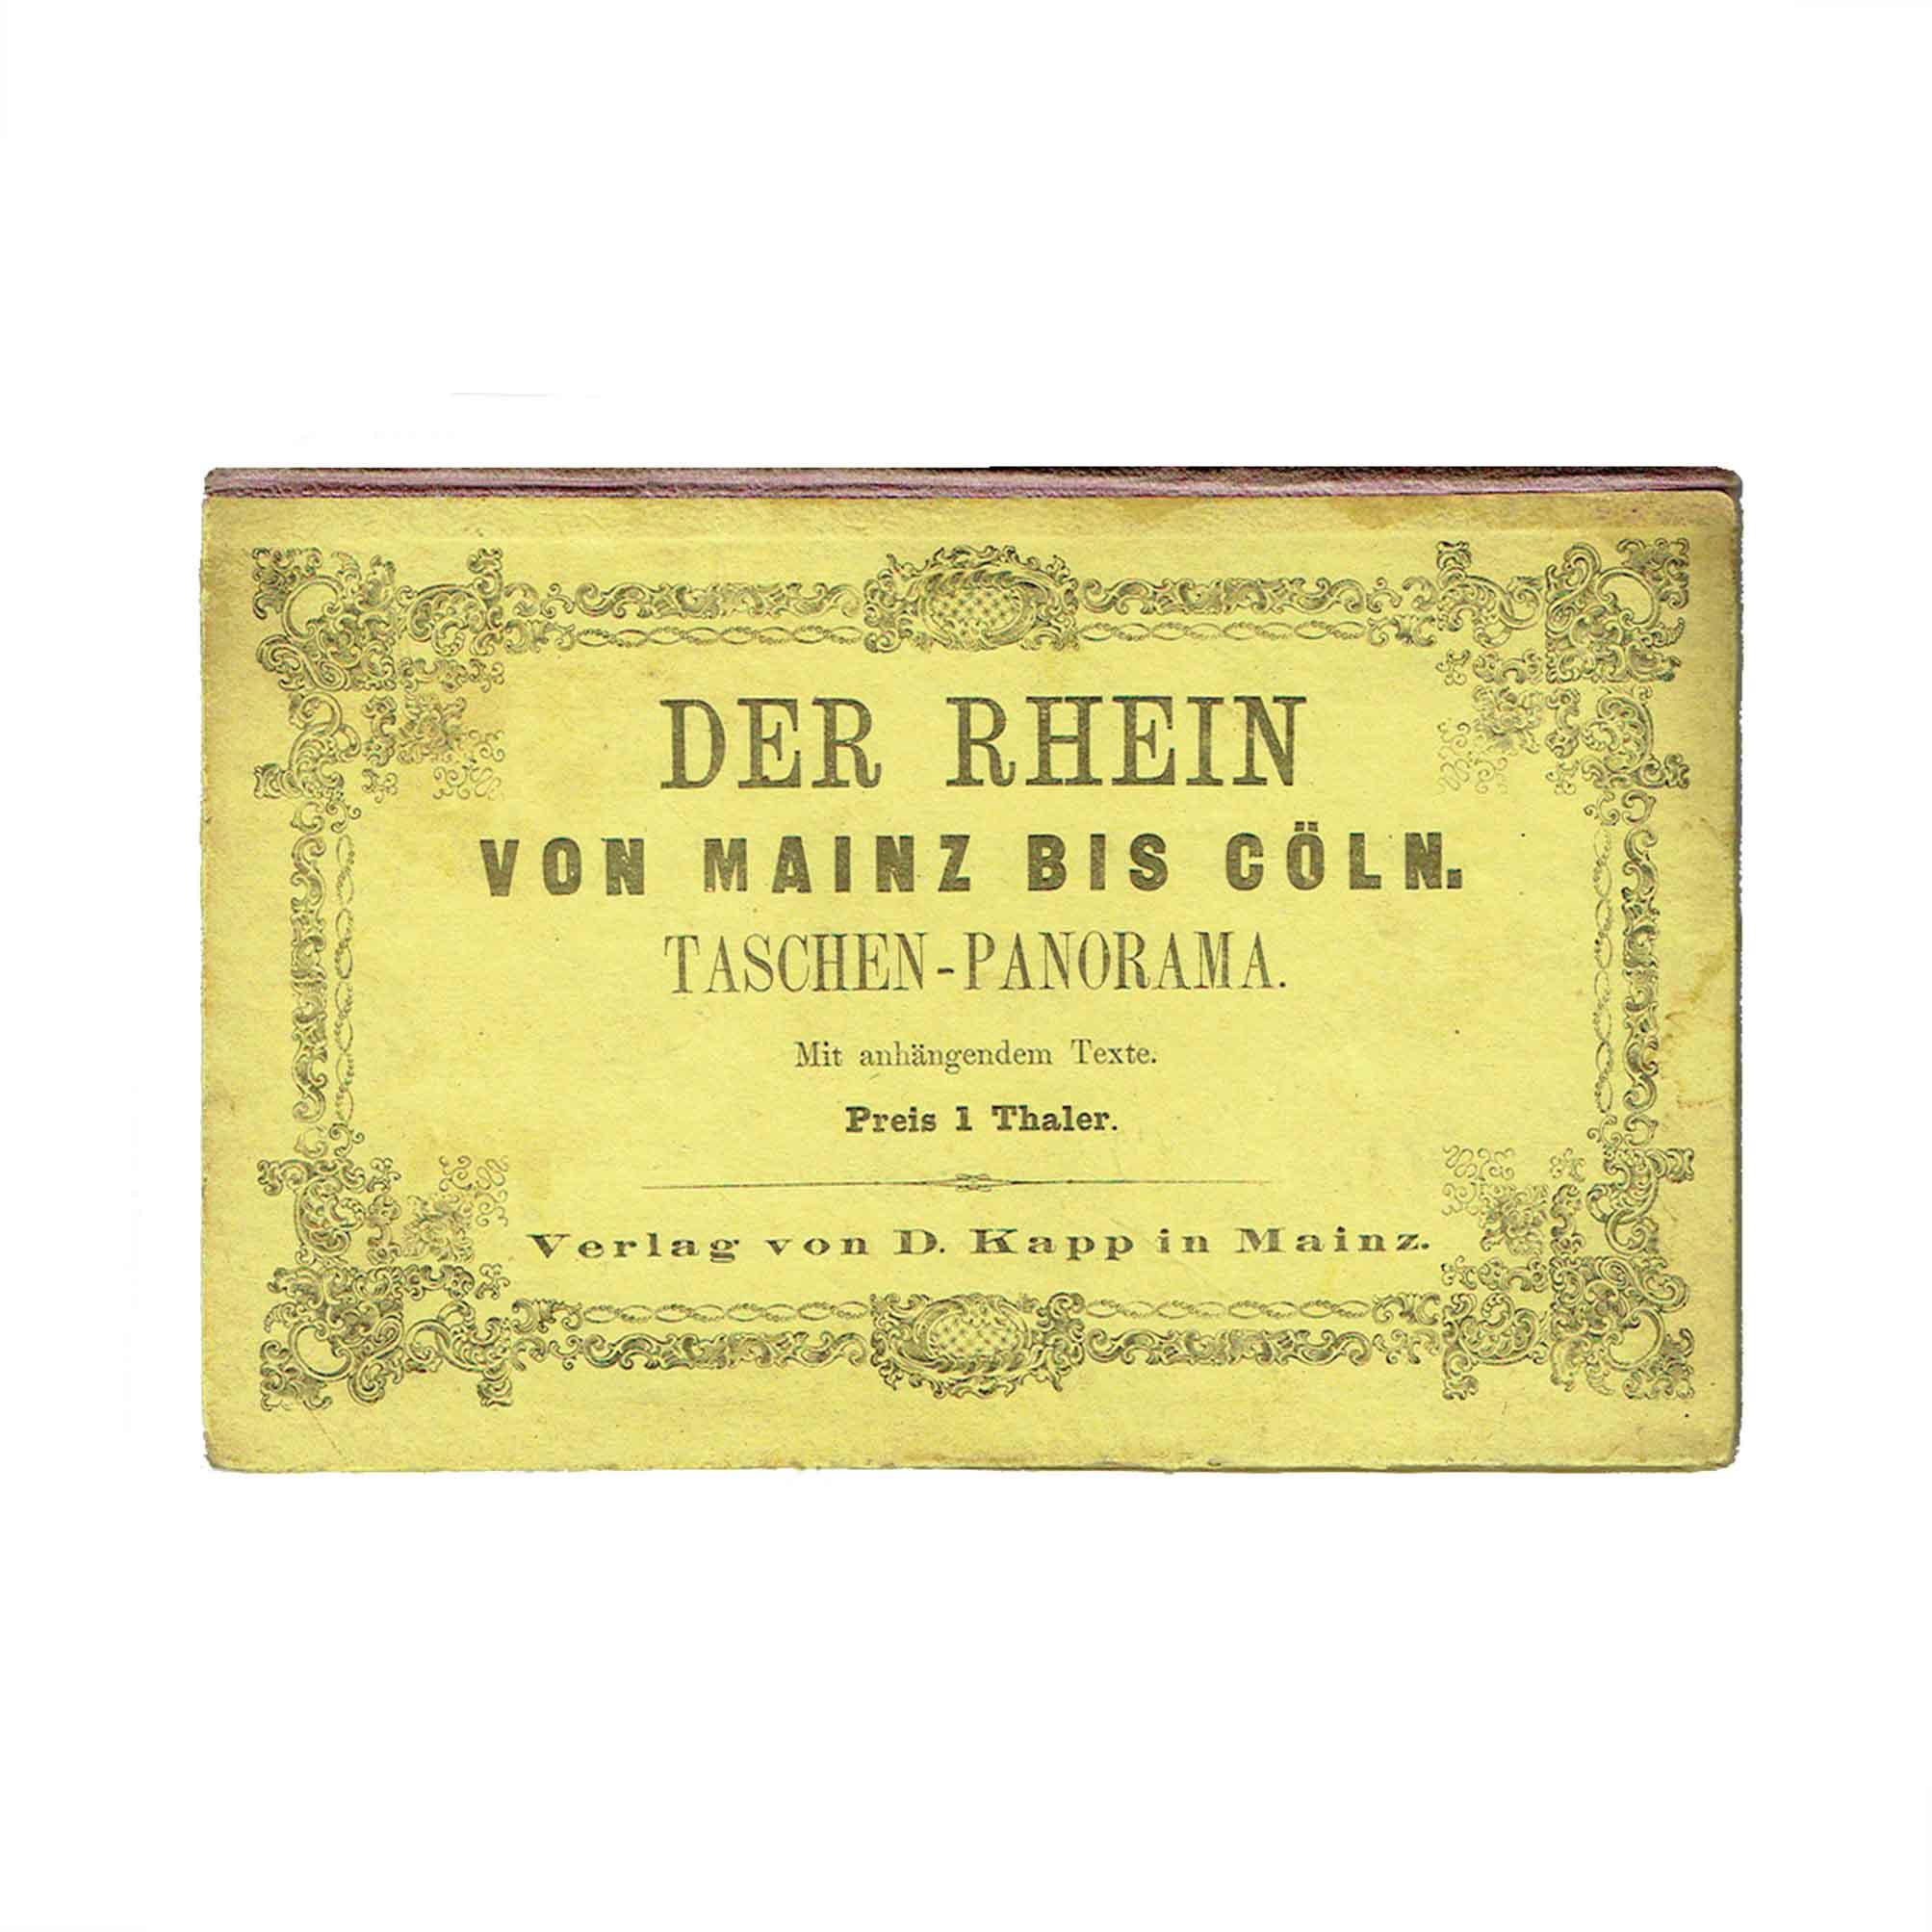 5513-Rhein-Mainz-Cöln-1867-Einband-frei-N.jpg